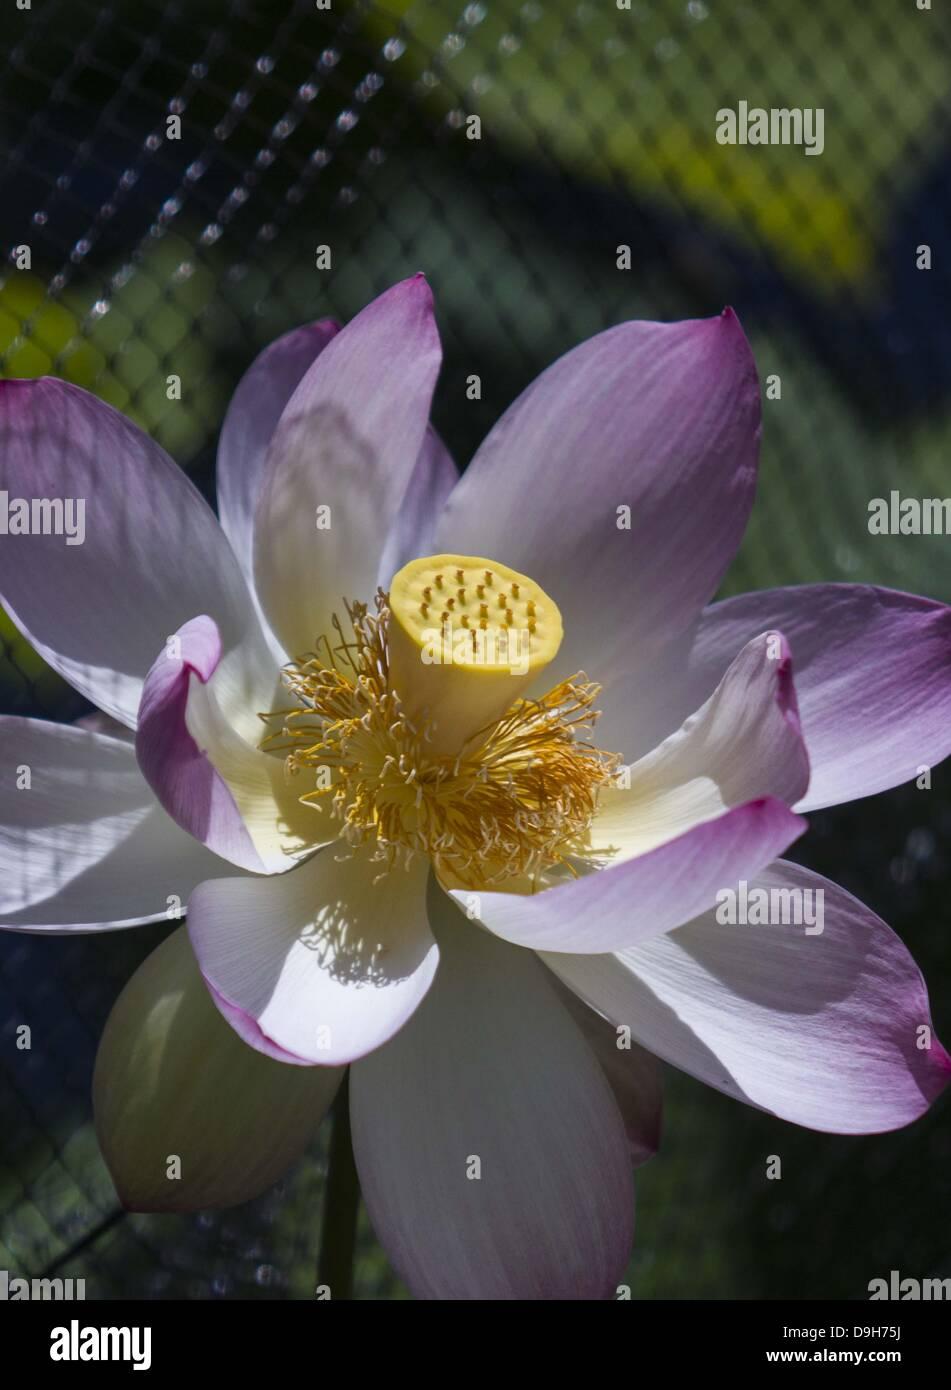 June 19 2013 Los Angeles California Us A Lotus Flower Stock